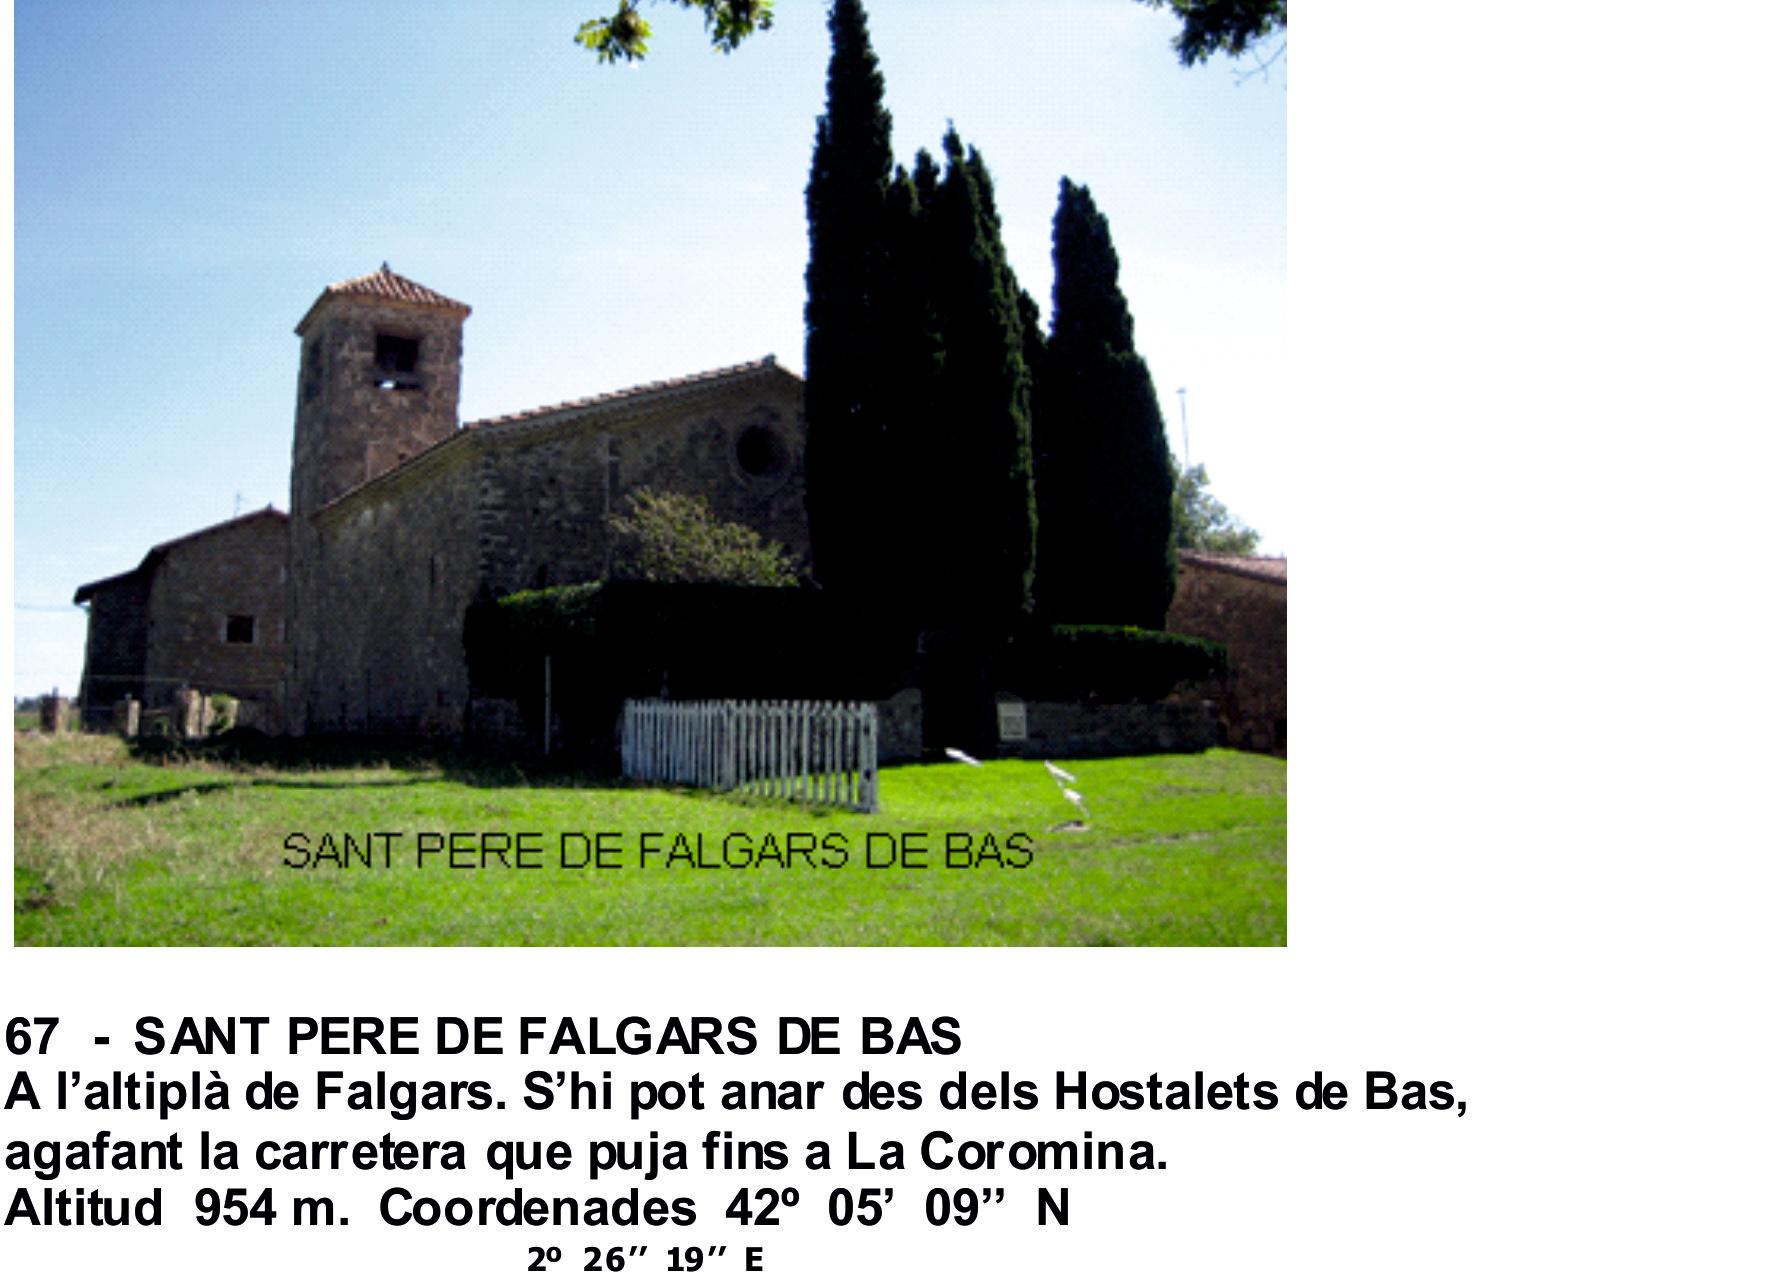 67  -  SANT PERE DE FALGARS DE BAS